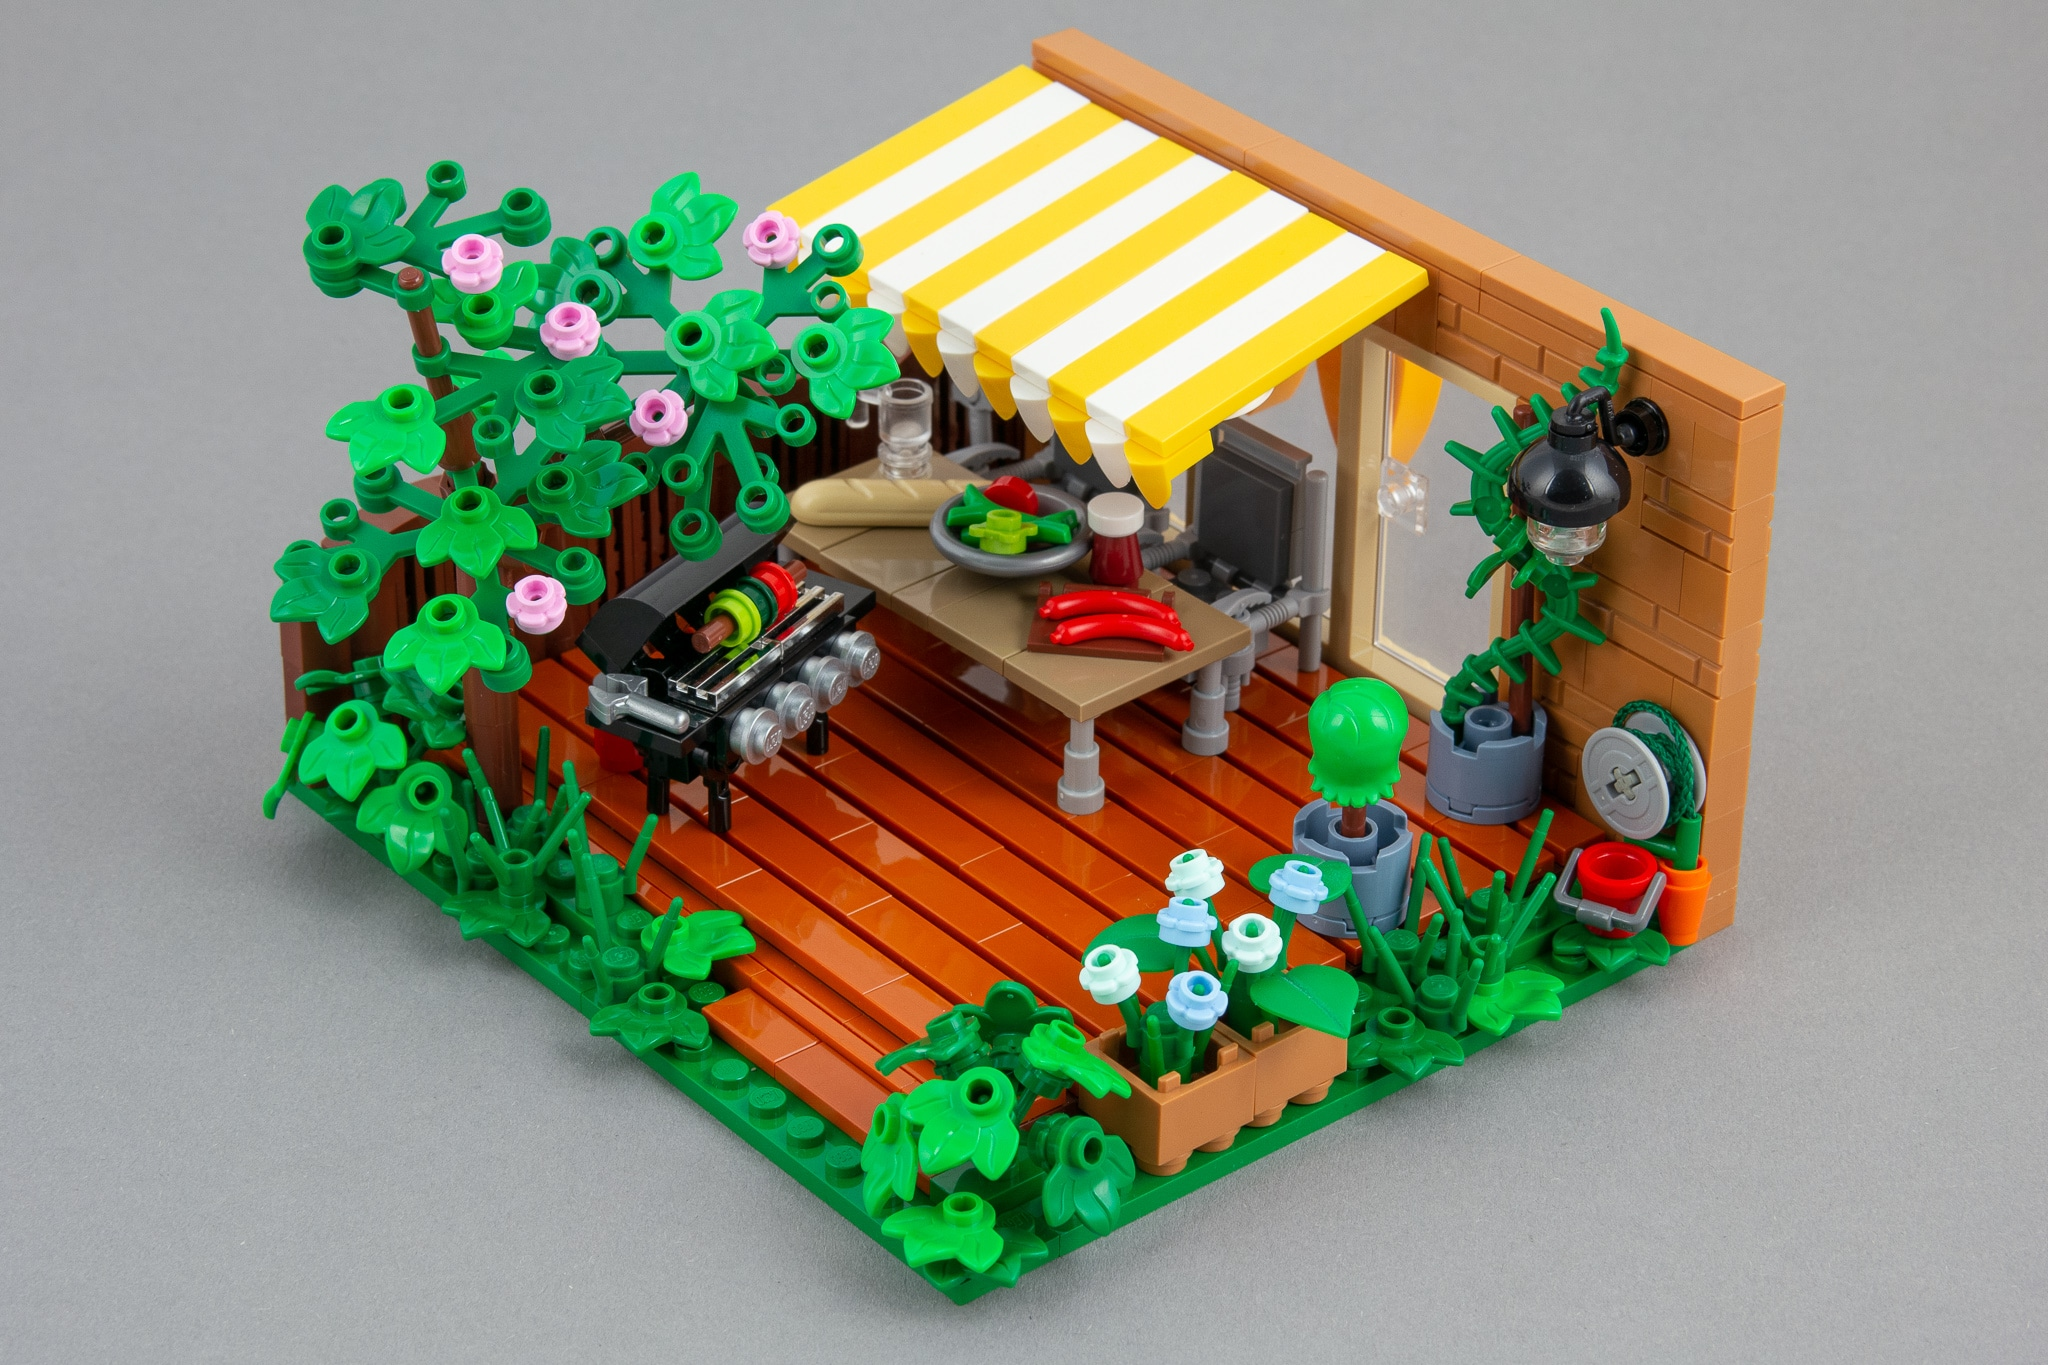 LEGO Terrasse Moc Grillen (12)